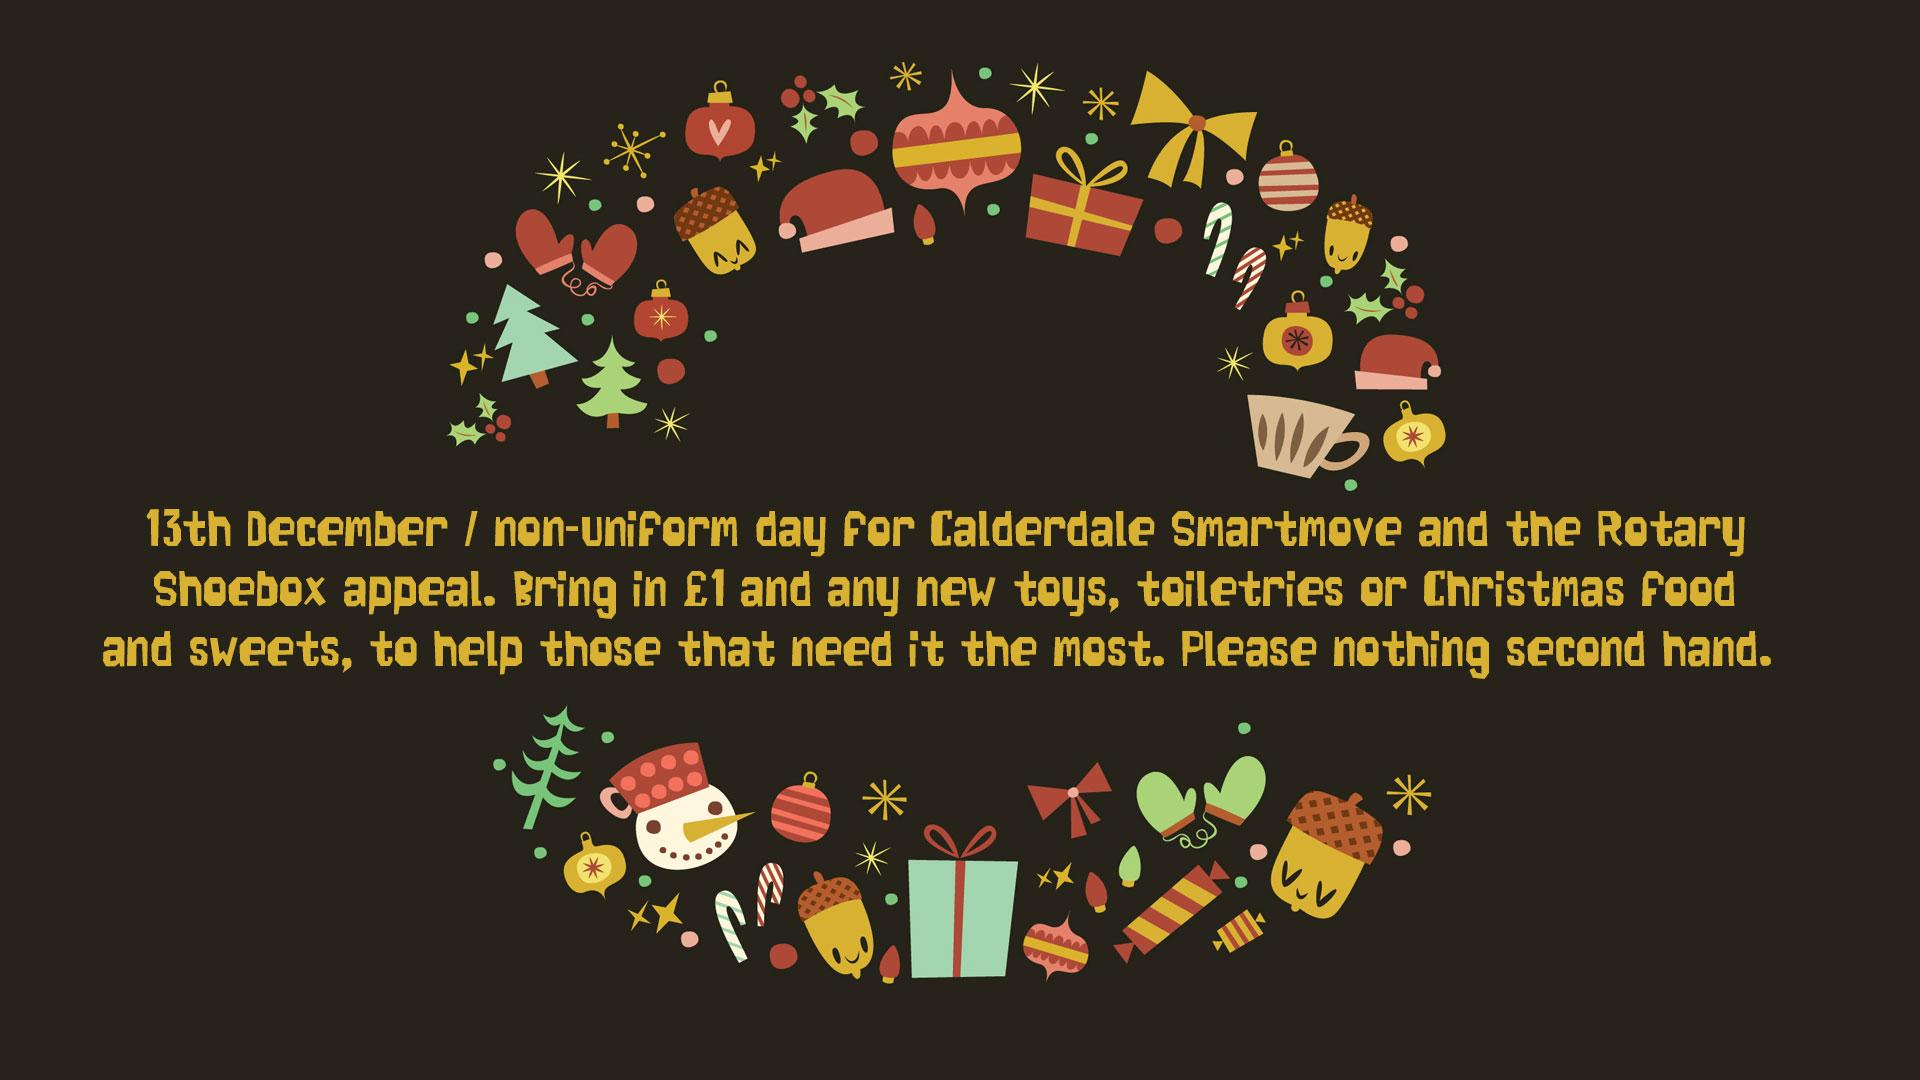 Non-Uniform Day / Rotary Shoeboxes